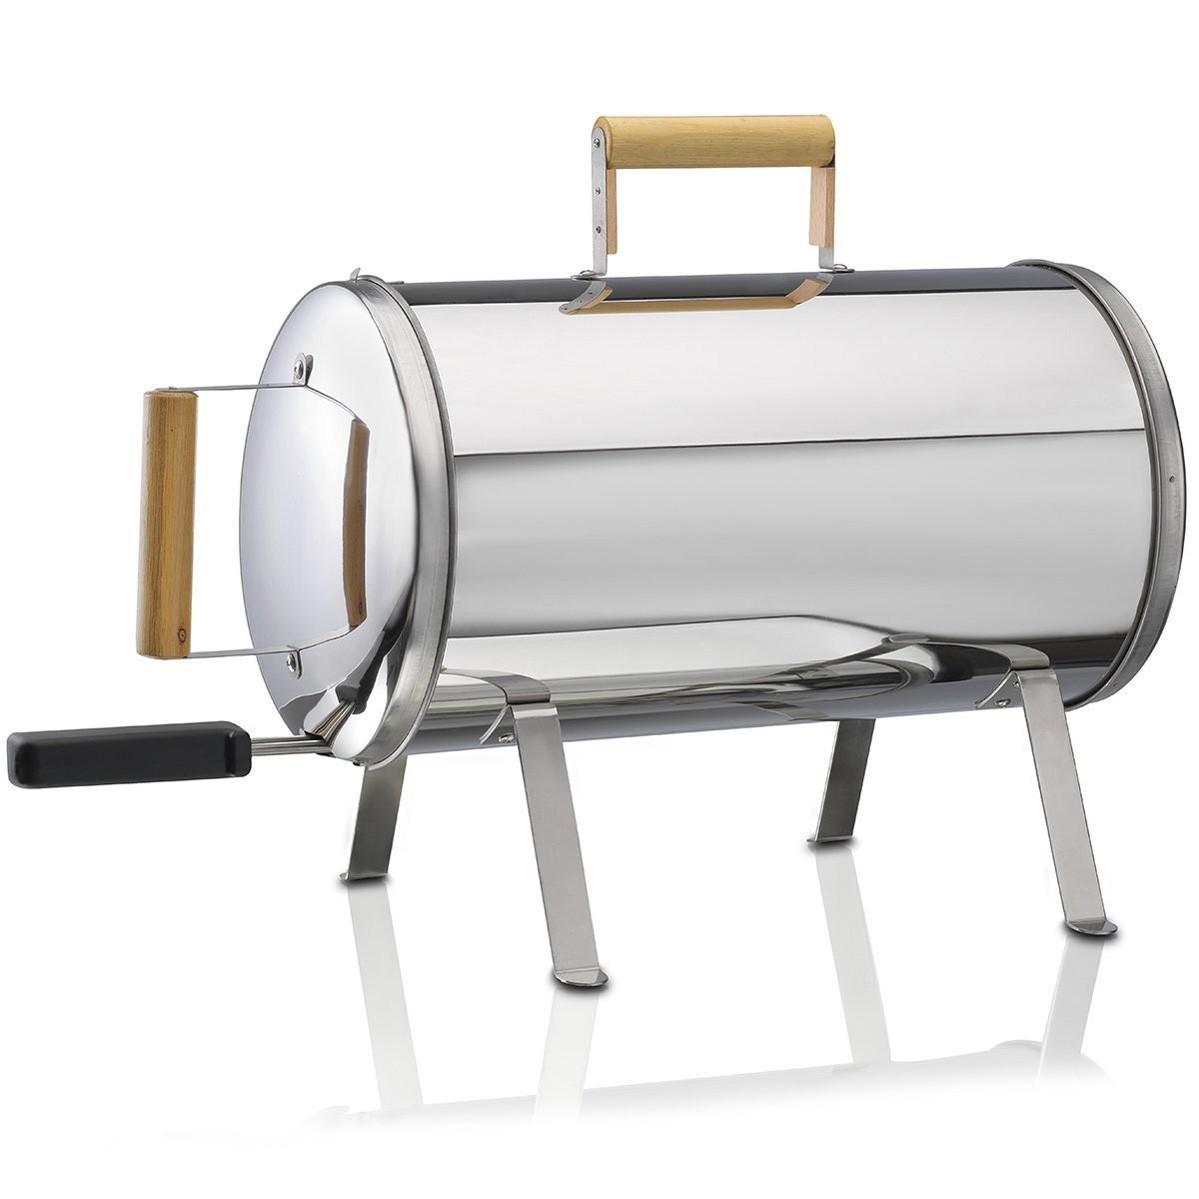 elektrischer r ucherofen melissa 16360016 k chenger te grill. Black Bedroom Furniture Sets. Home Design Ideas